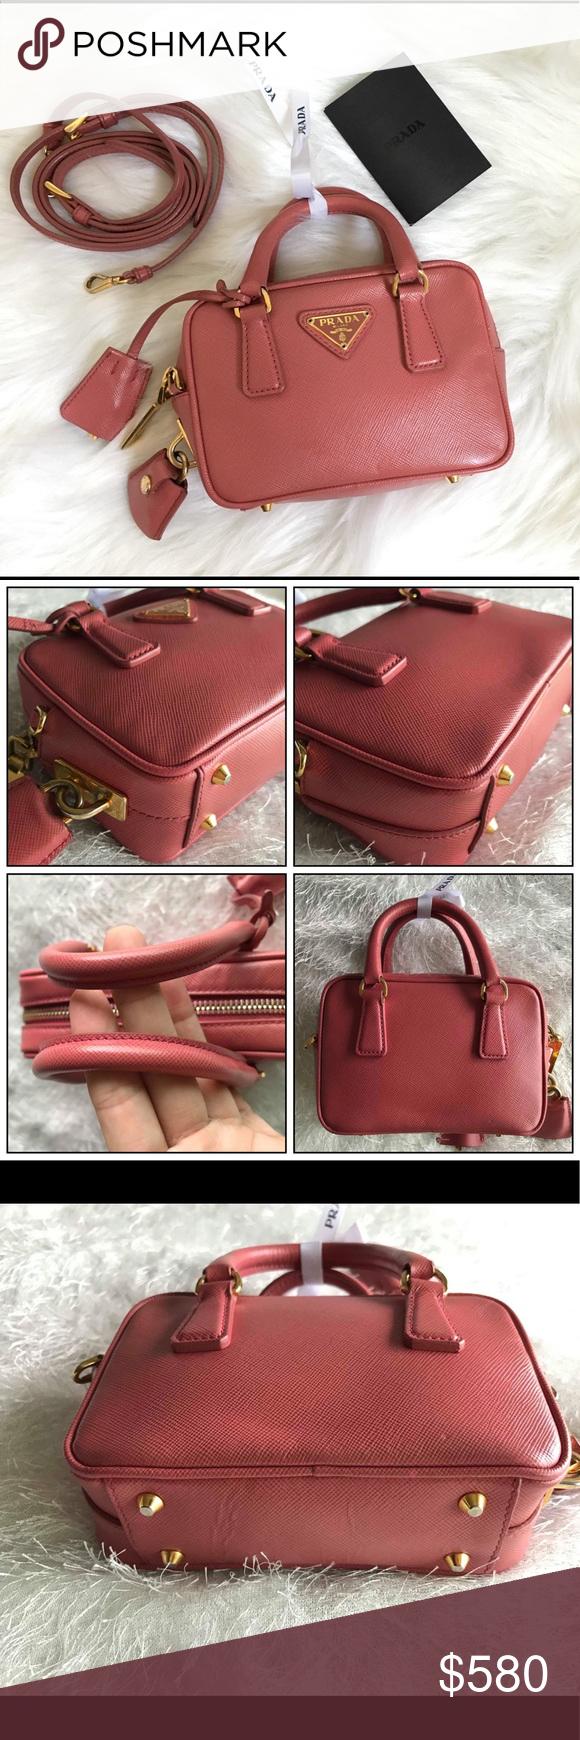 28528ecac7a Prada Handbags · SALE ❗️Prada Saffiano Lux Mini Crossbody This chic  cross-body baguette is crafted of